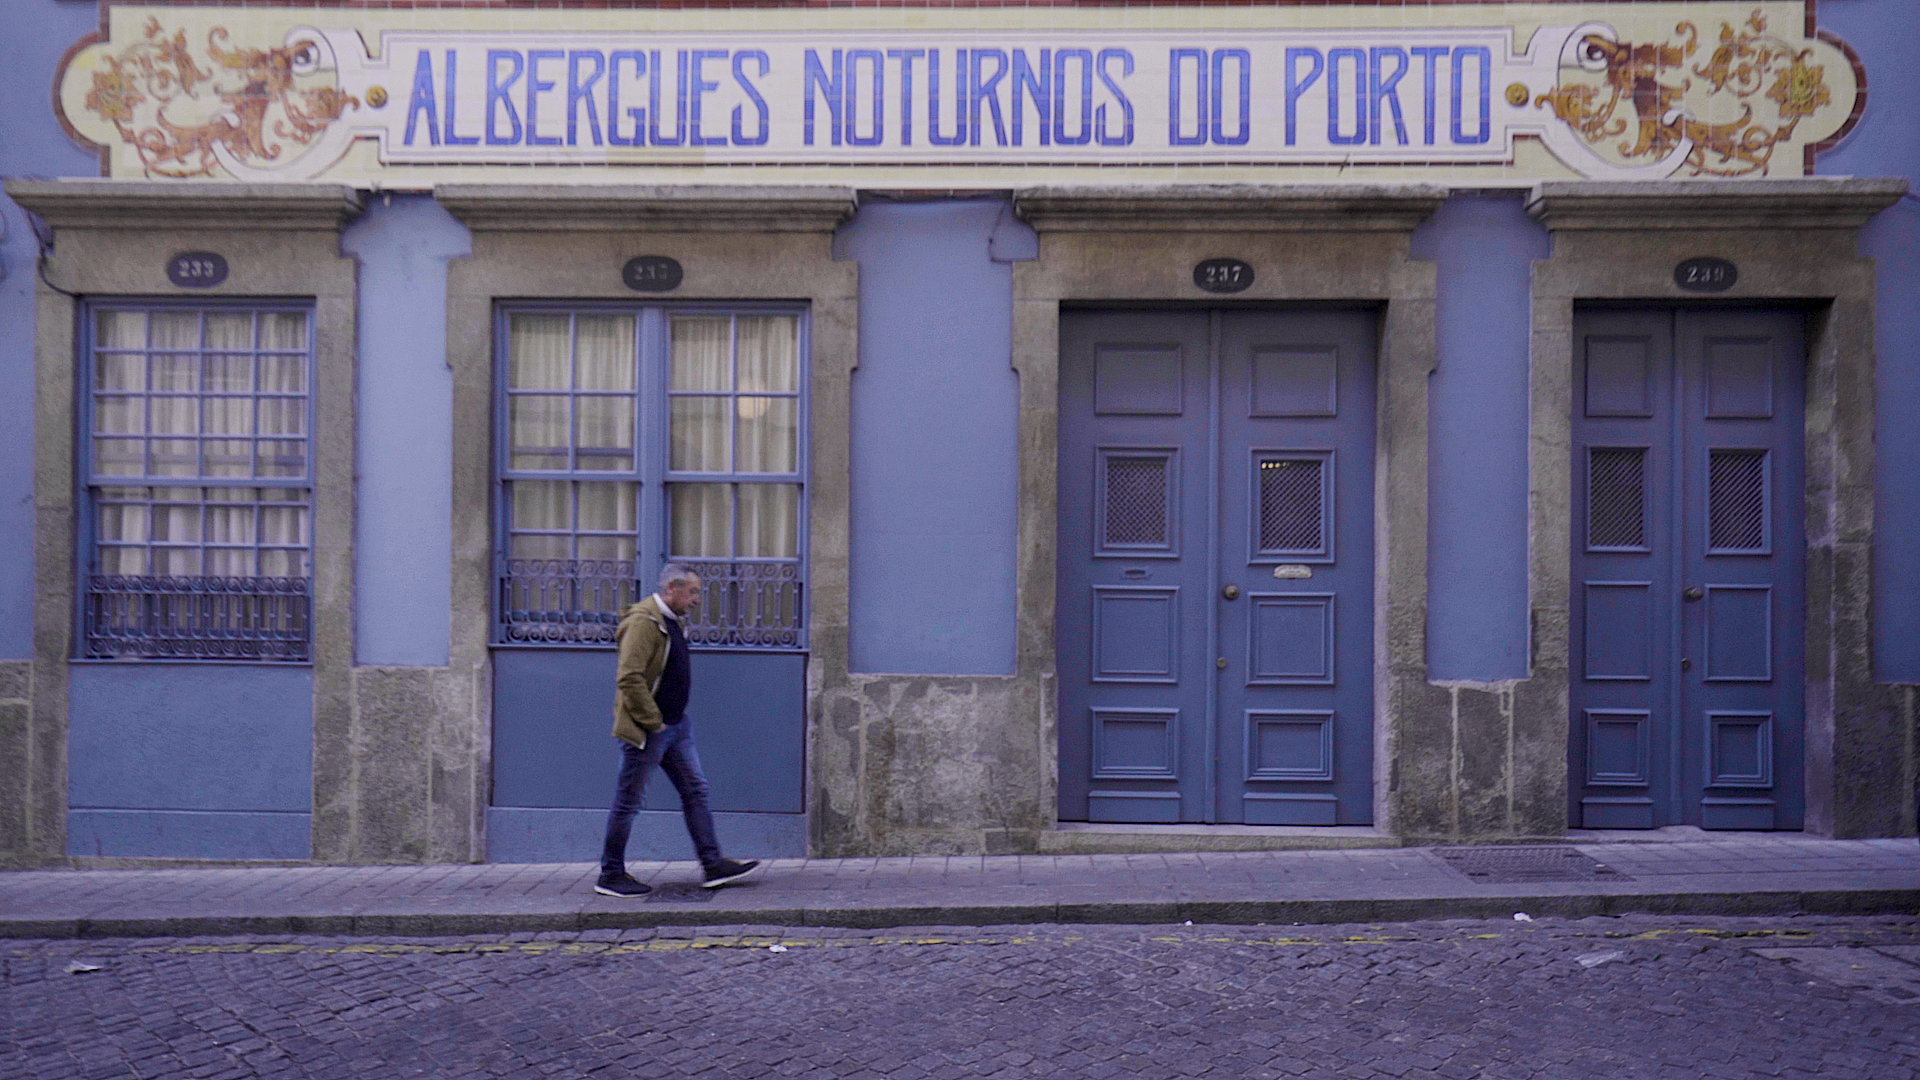 Simon Prize - Finalist - Short Film : Albuergues Noturnos do Porto2018